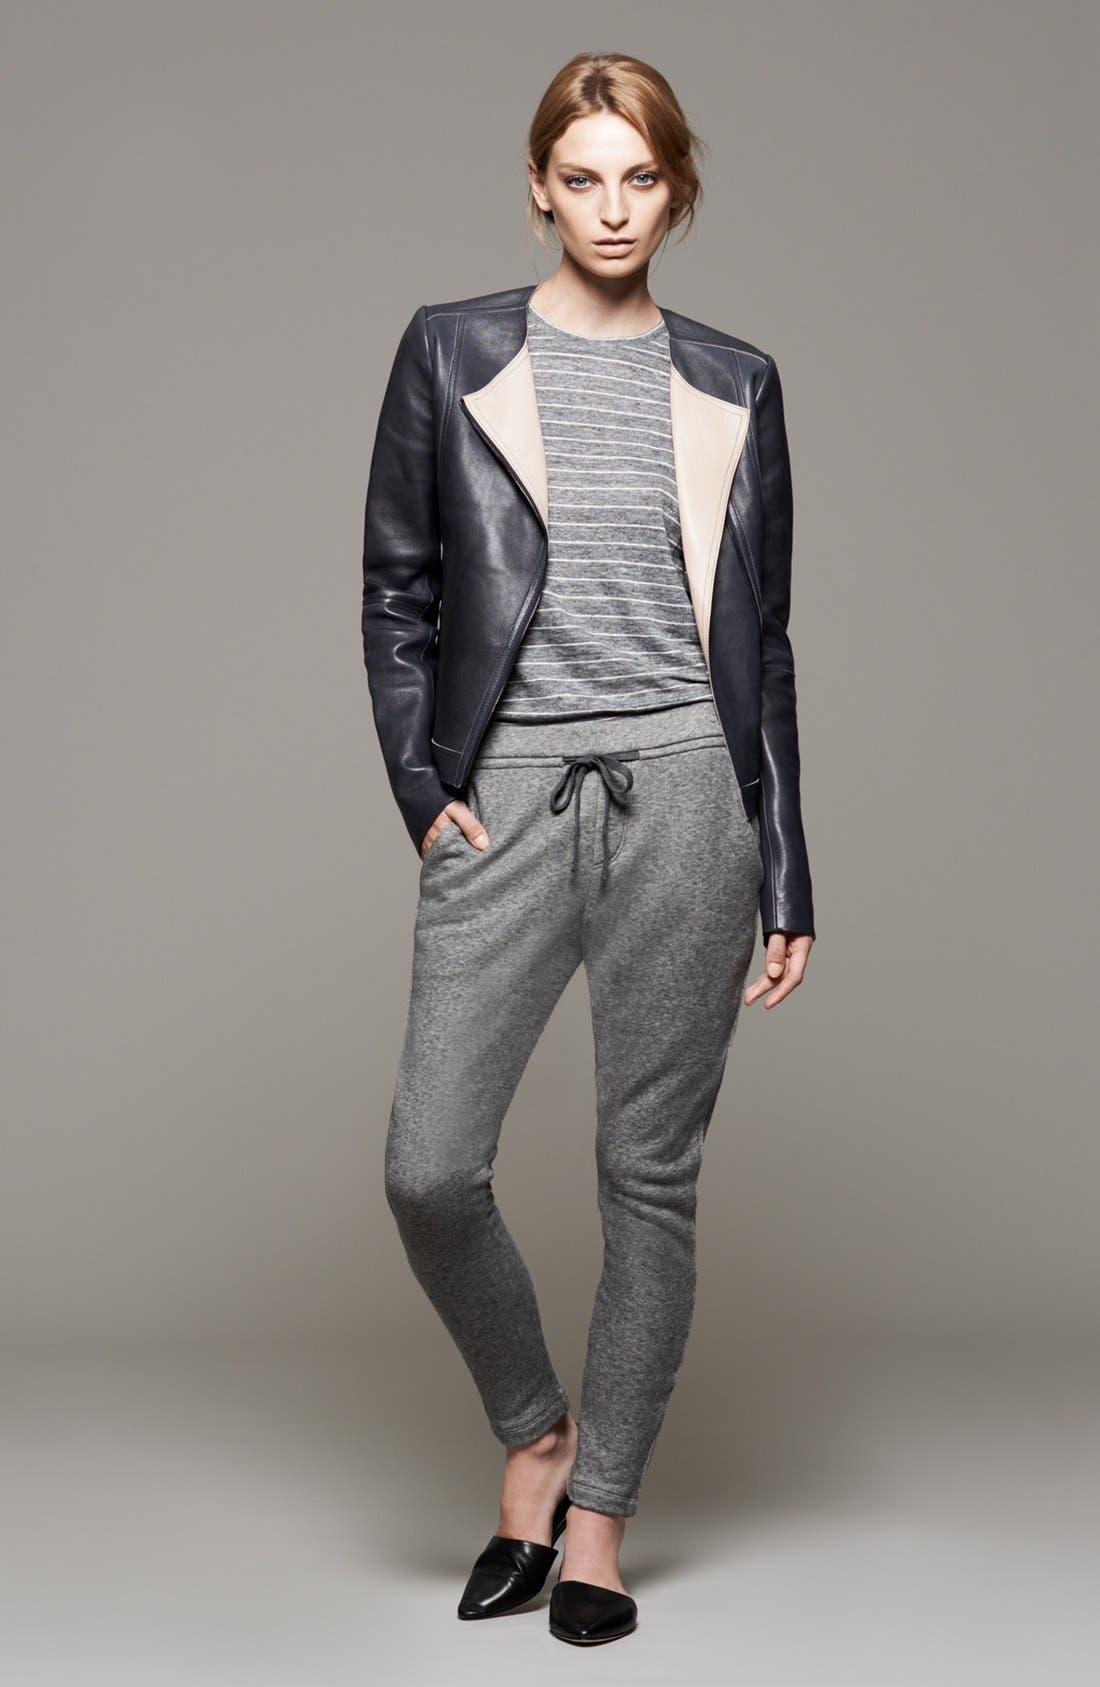 Main Image - Vince Leather Jacket, Tee & Sweatpants